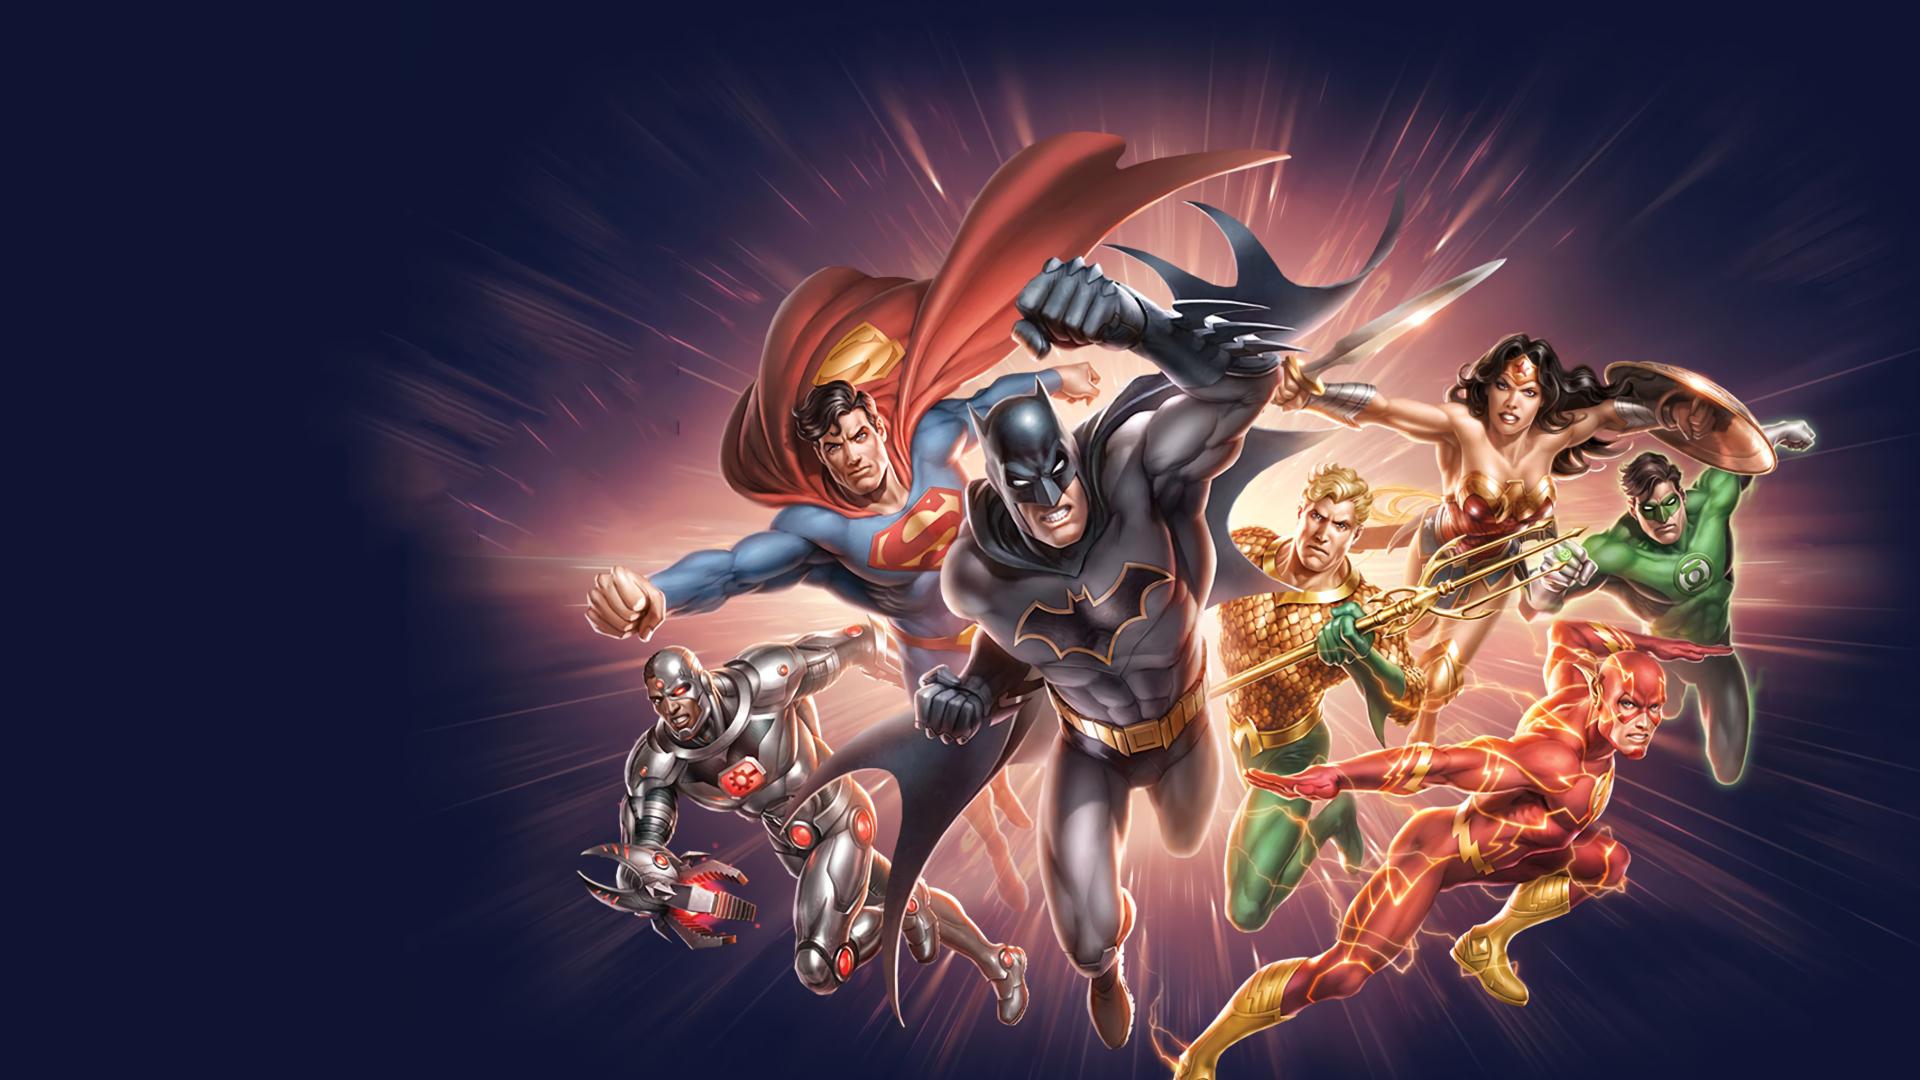 1920x1080 Justice League 4K 1080P Laptop Full HD Wallpaper ...